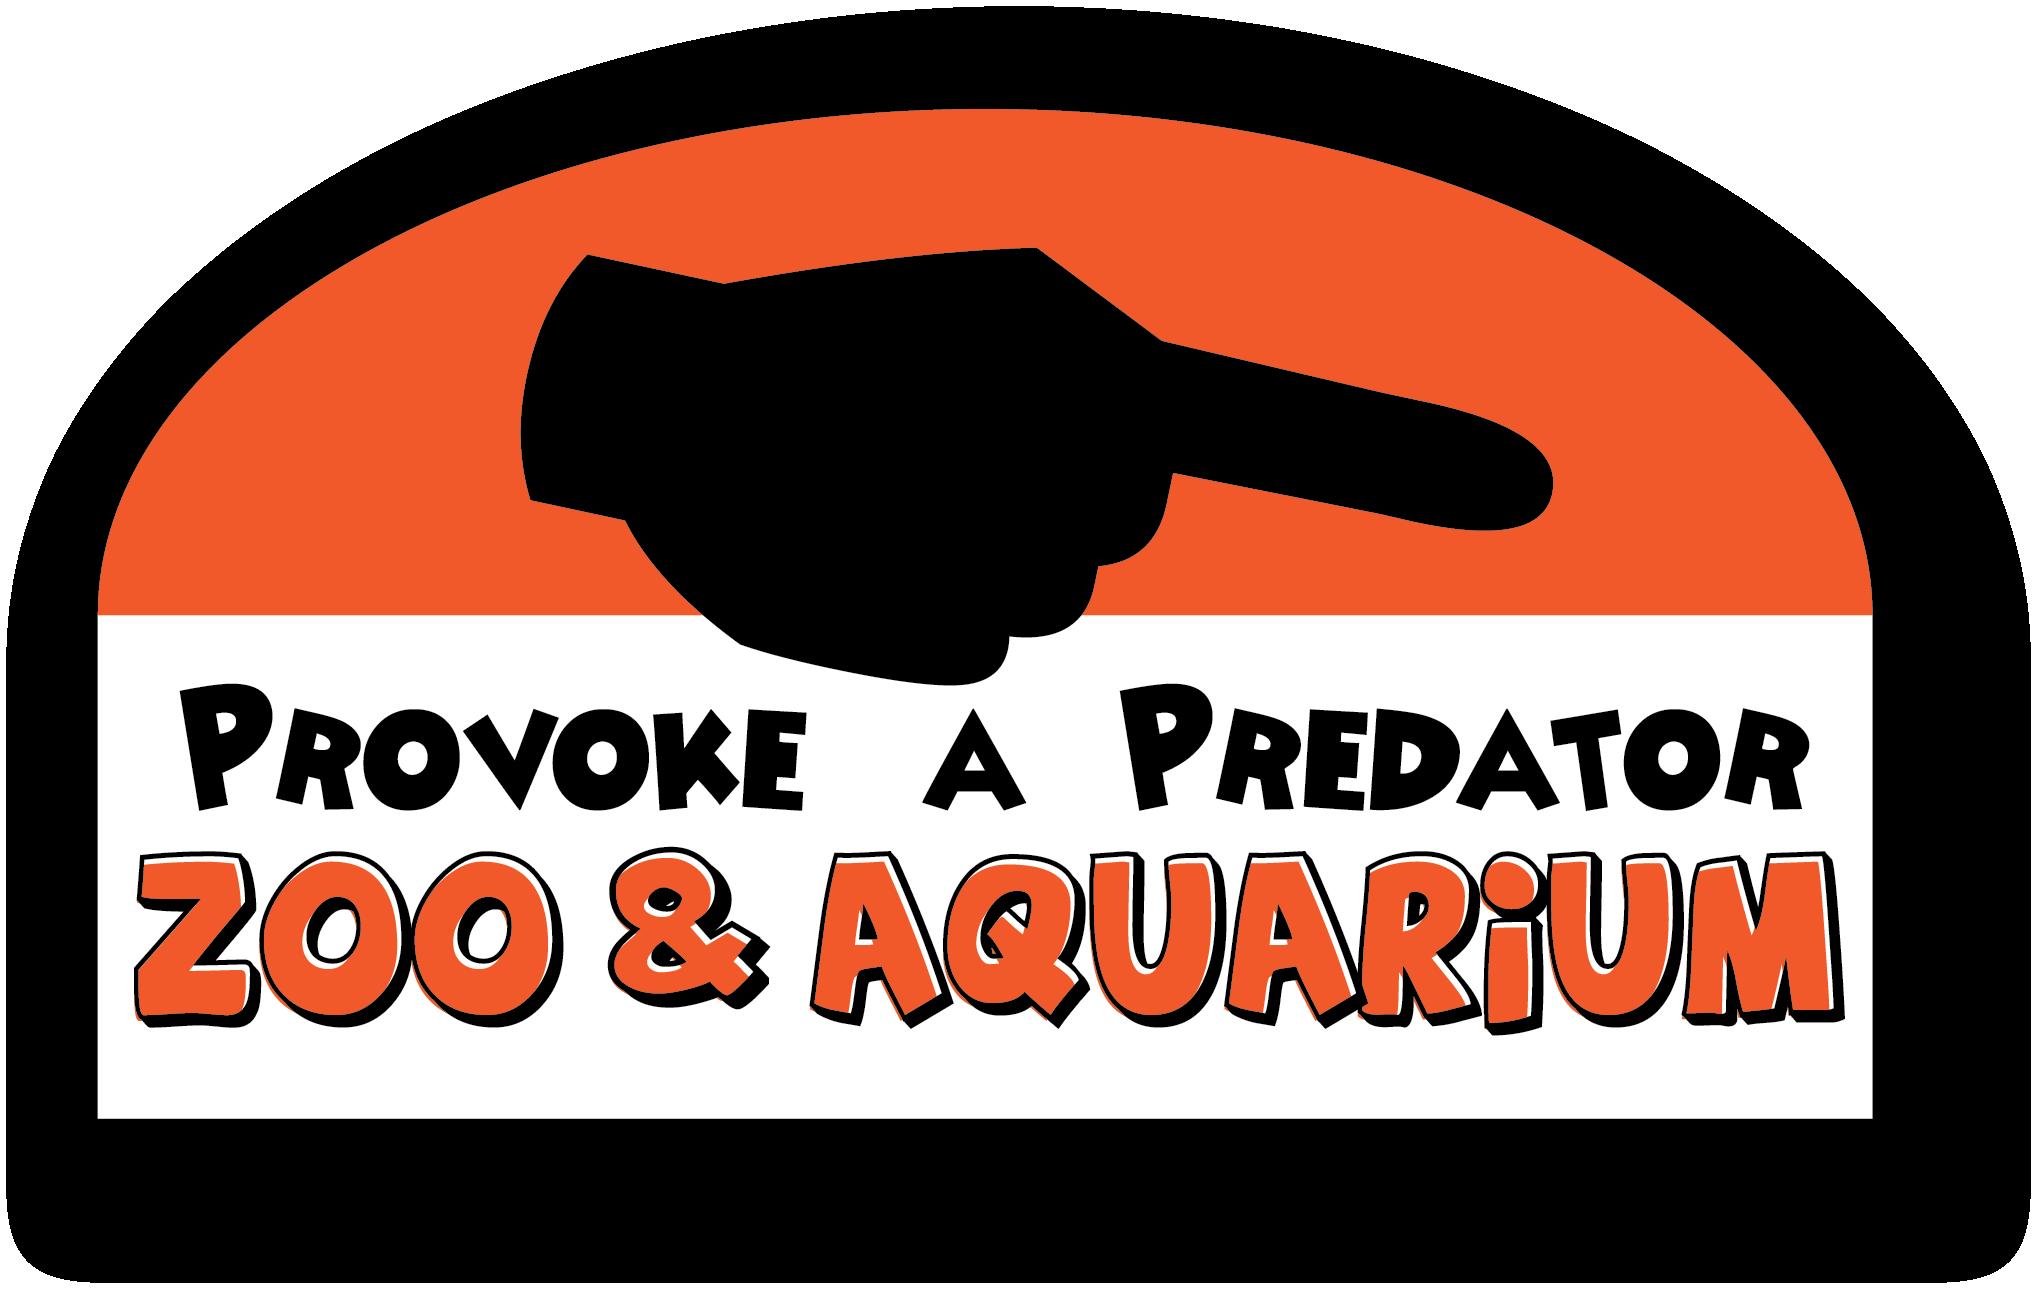 Provoke A Predator